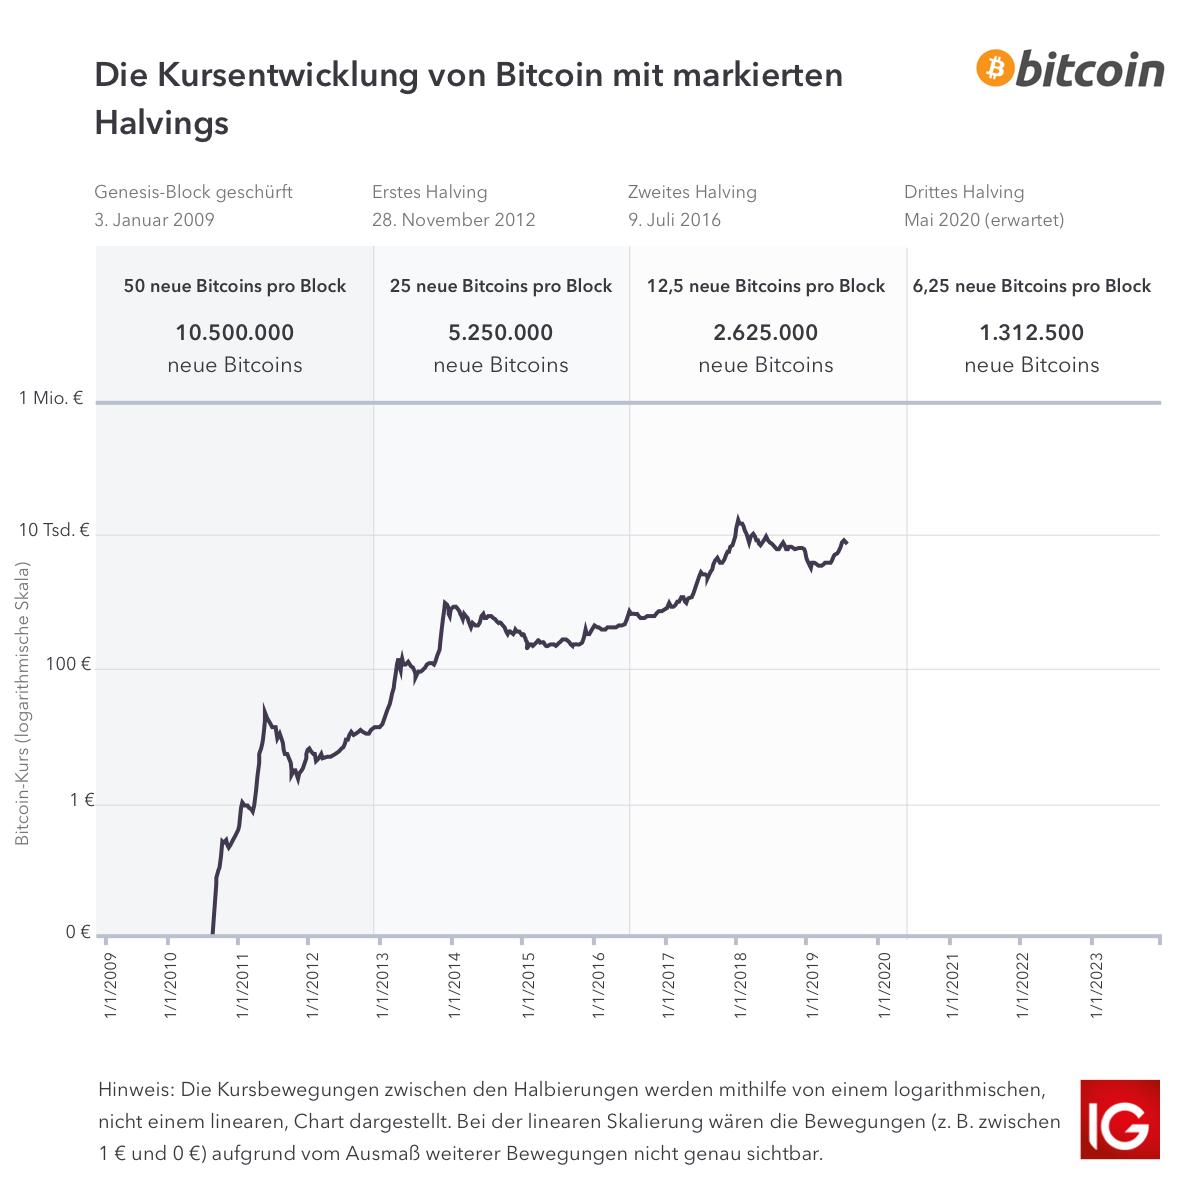 binäre optionen langfristig handeln was ist bitcoin-handel im moment